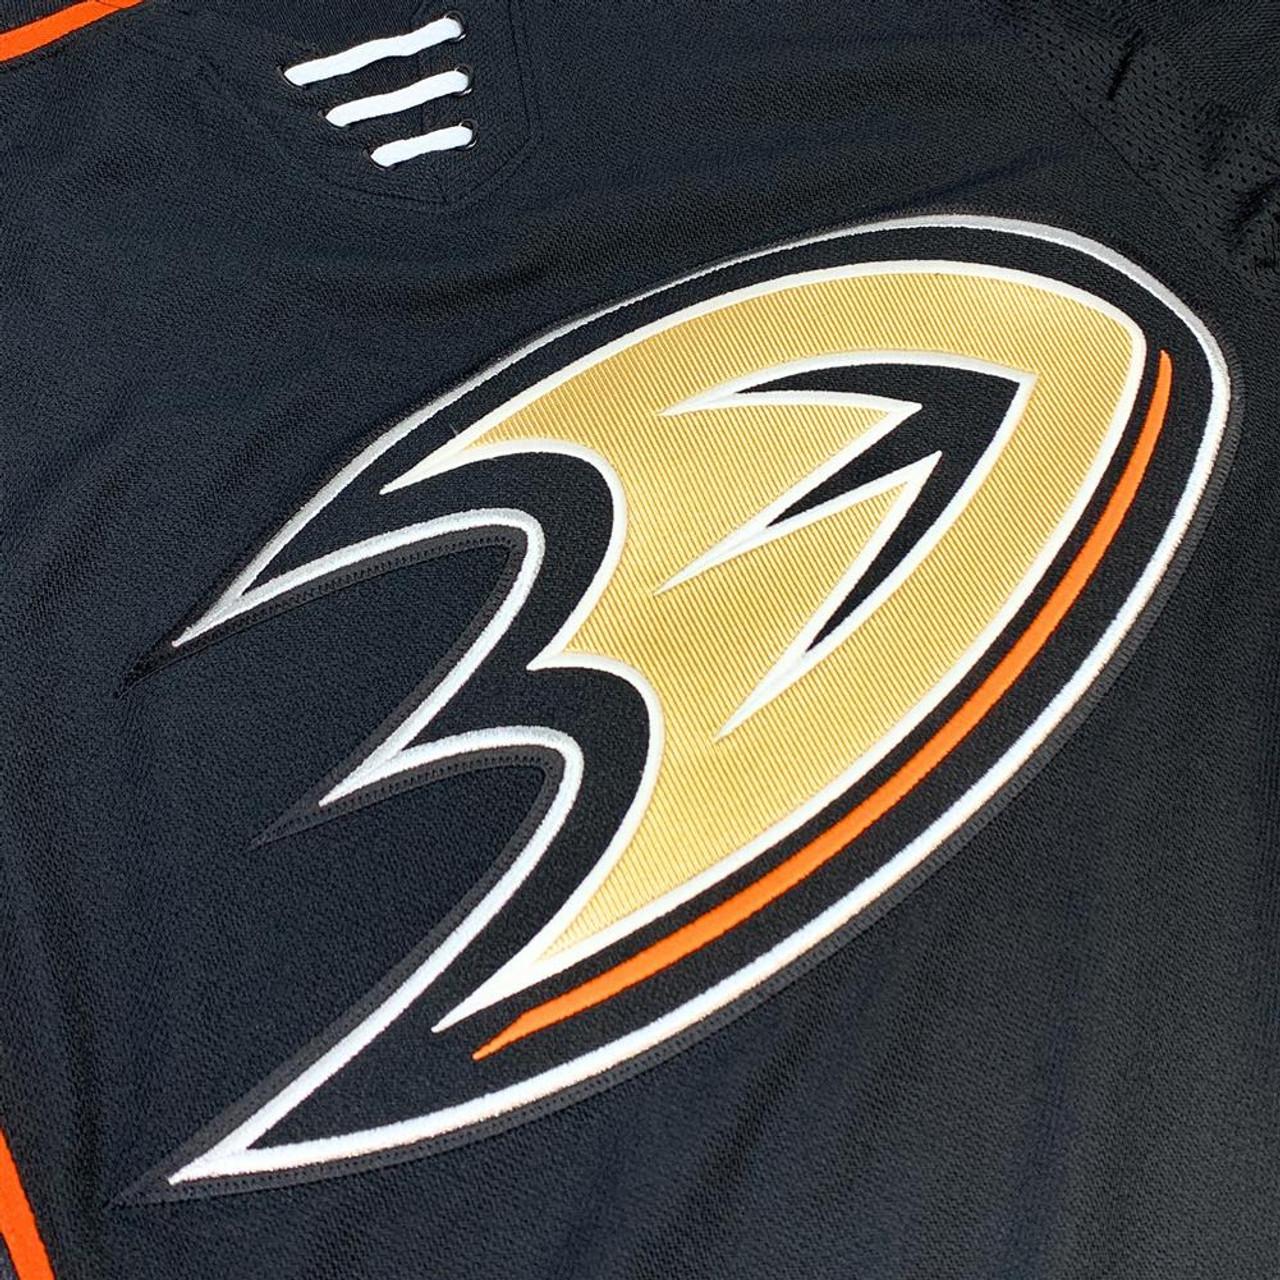 Authentic Anaheim Ducks Jersey Adidas Home Jersey NHL